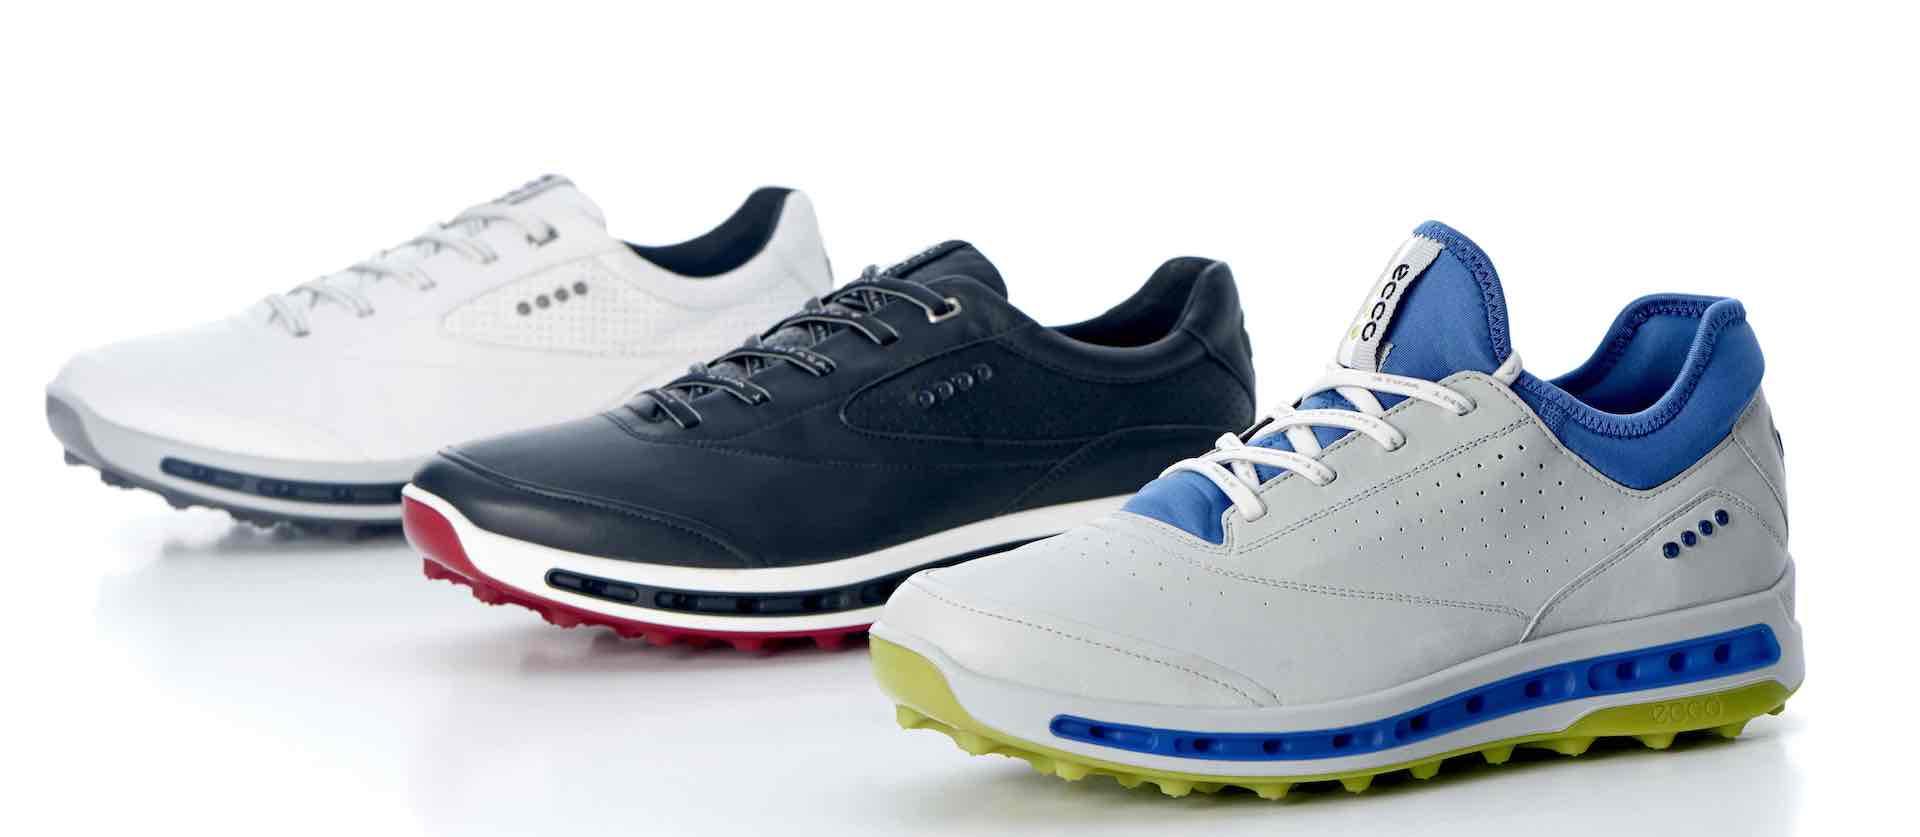 Ecco Golf unveils new Ecco Cool Pro